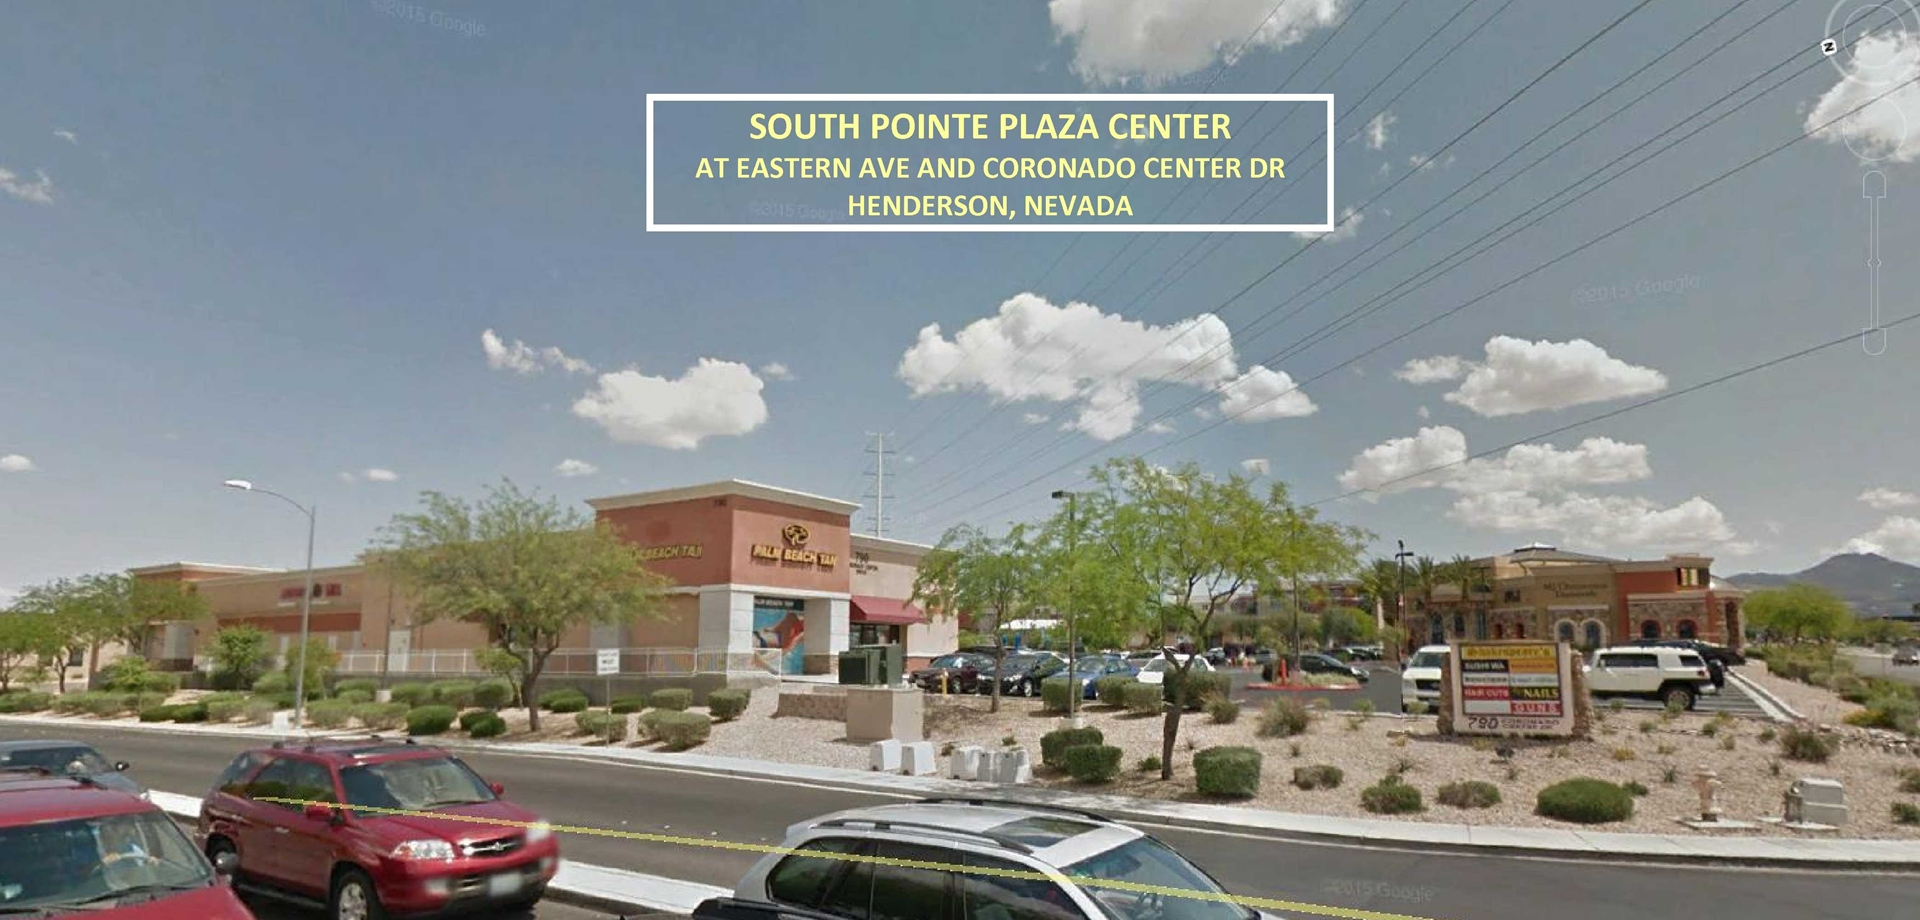 S Pointe Plaza 5